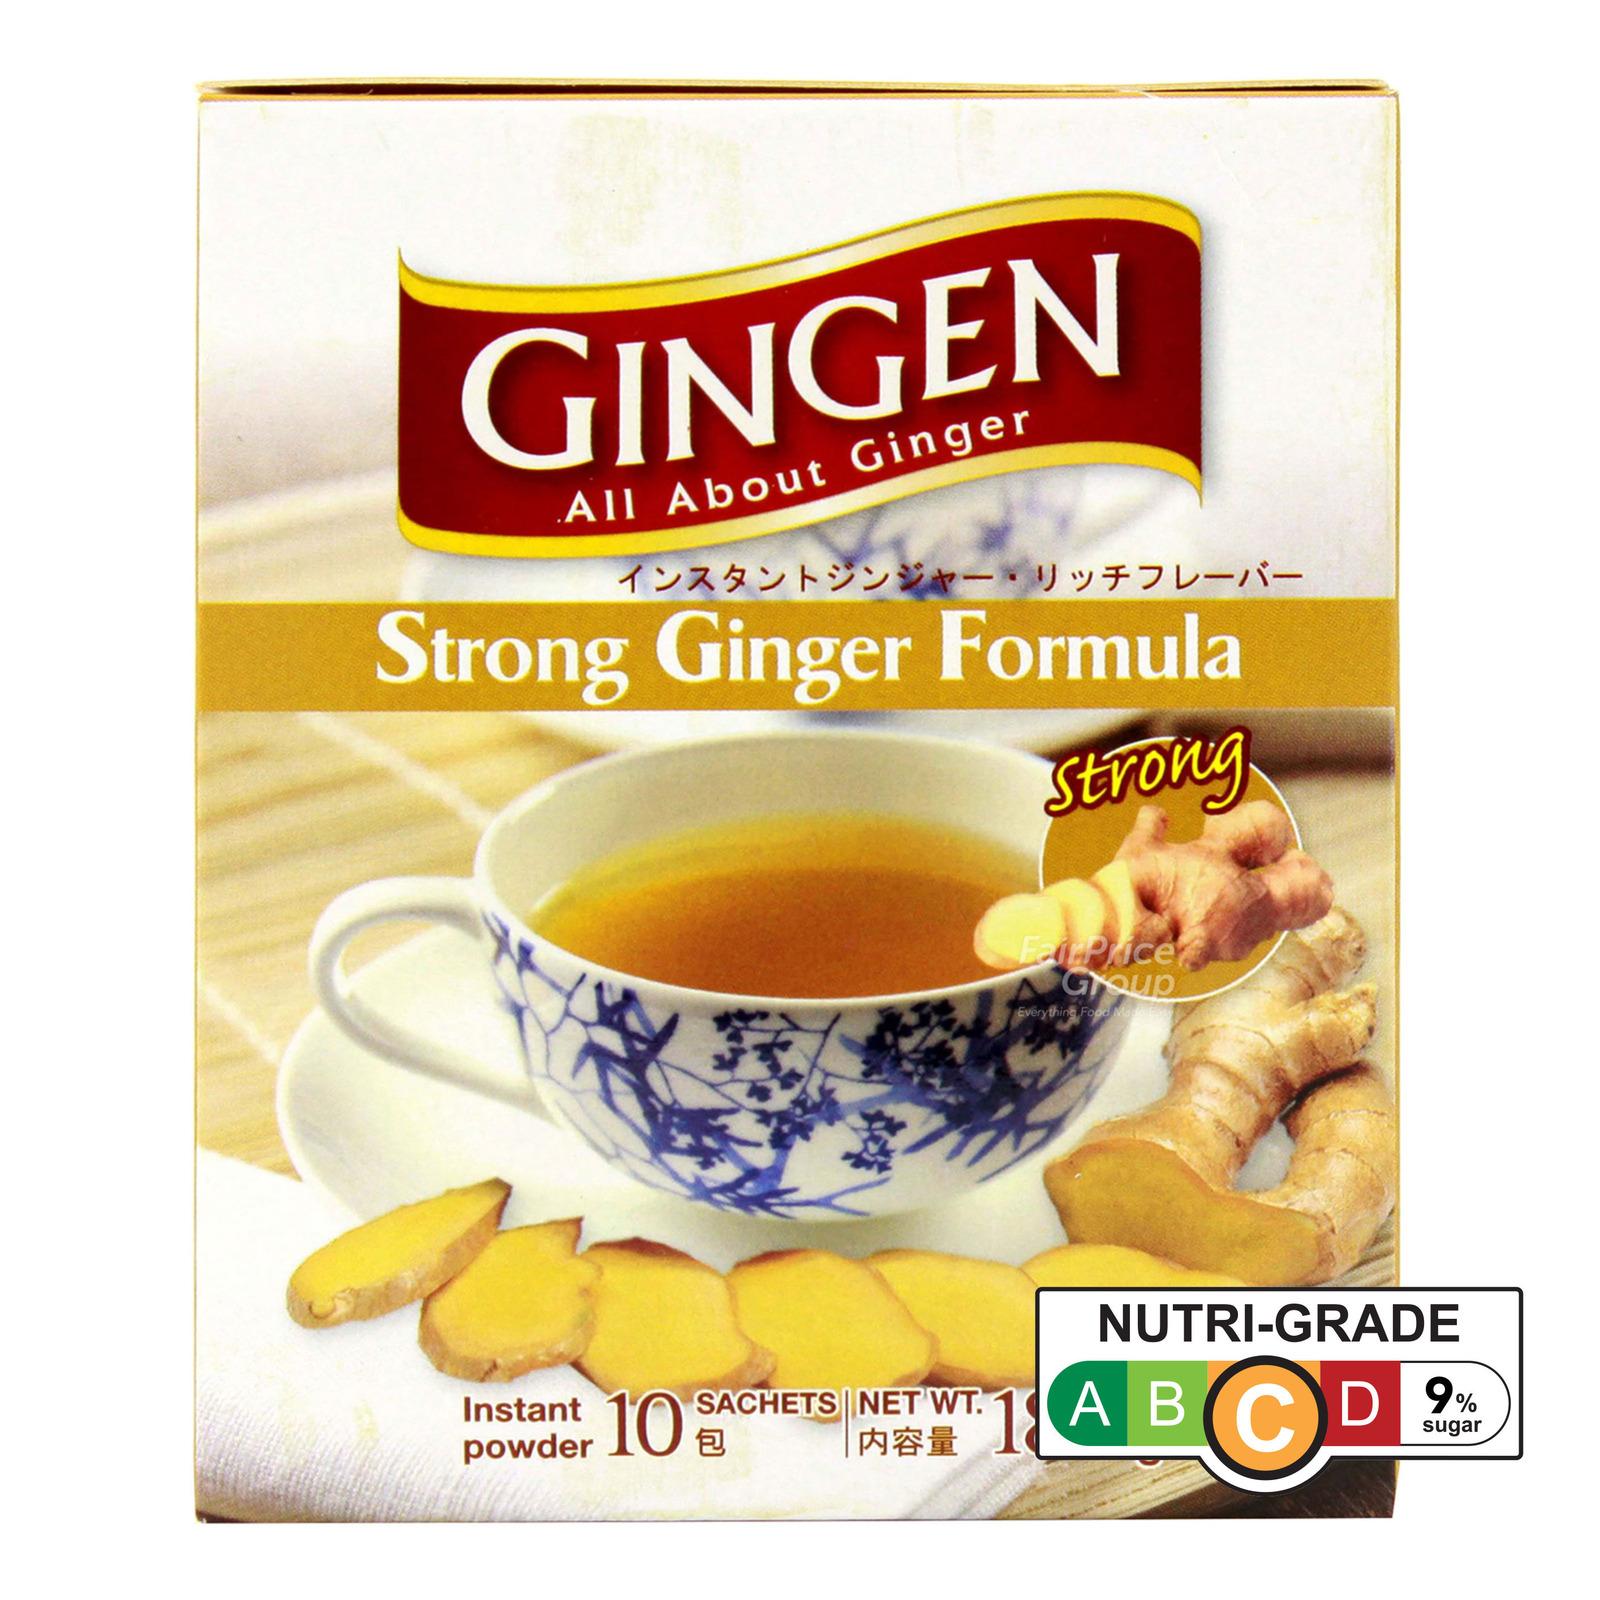 Gingen Ginger with Honey Instant Powder